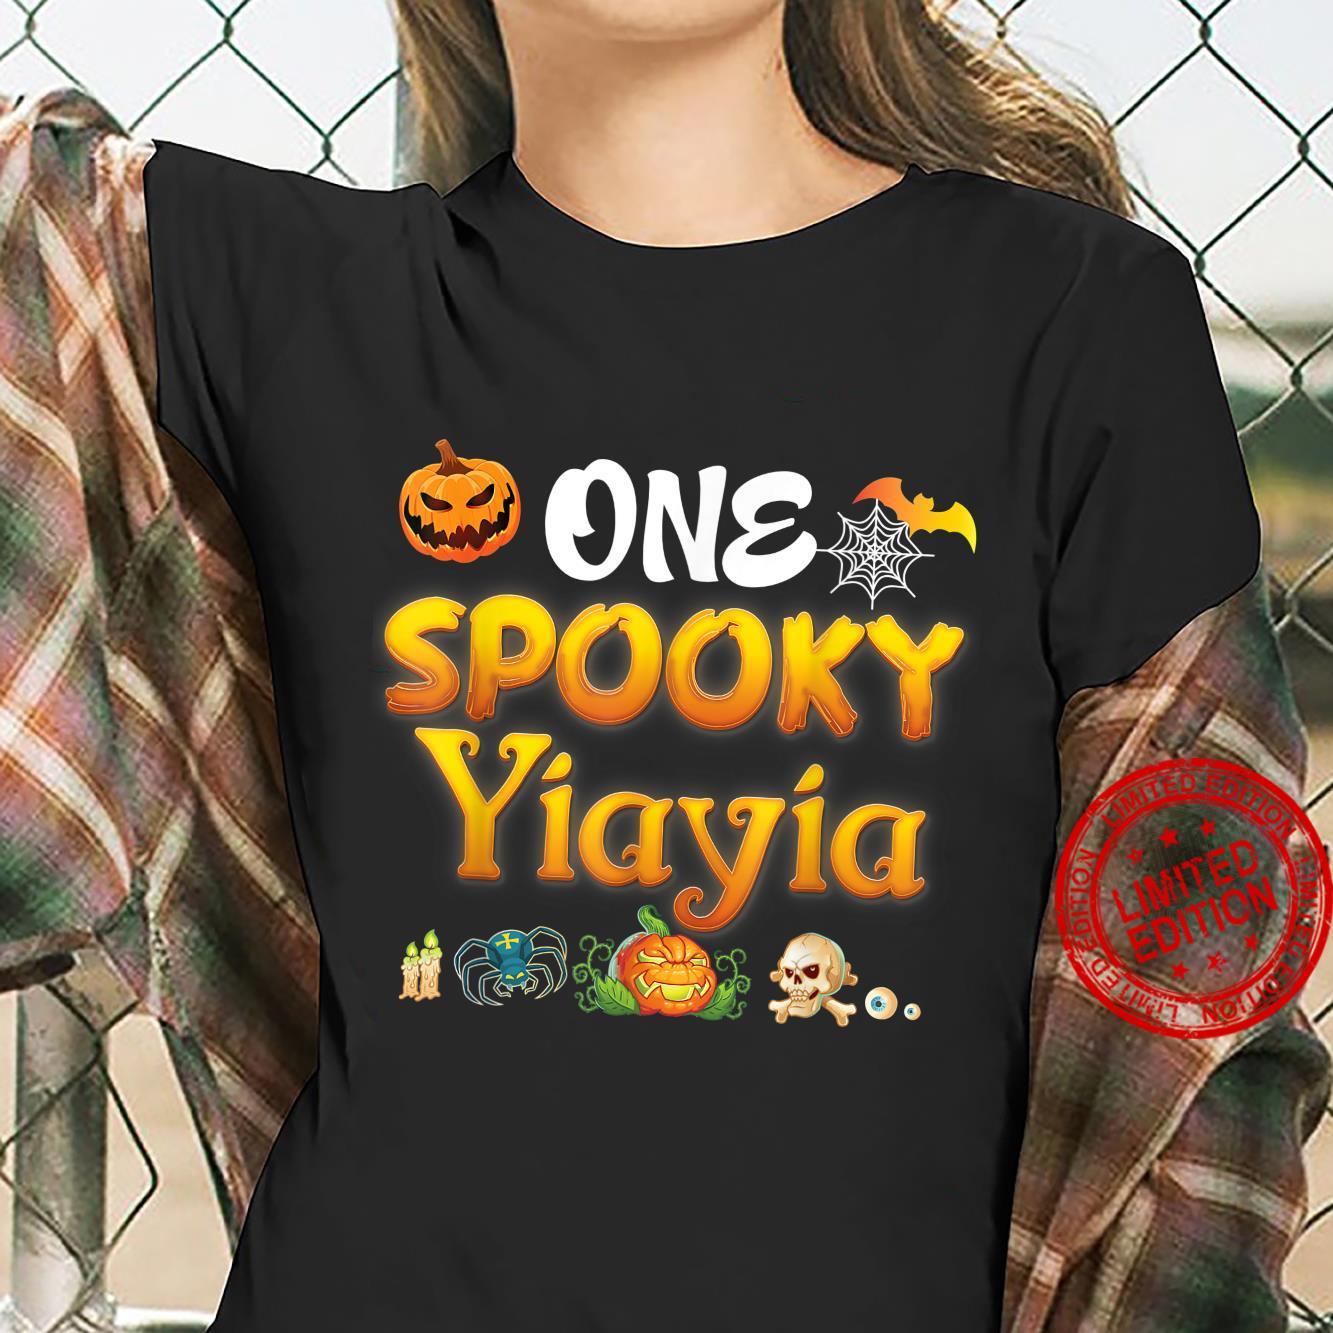 One Spooky Yiayia Scary Pumpkin Horor Halloween Ghost Creepy Shirt ladies tee